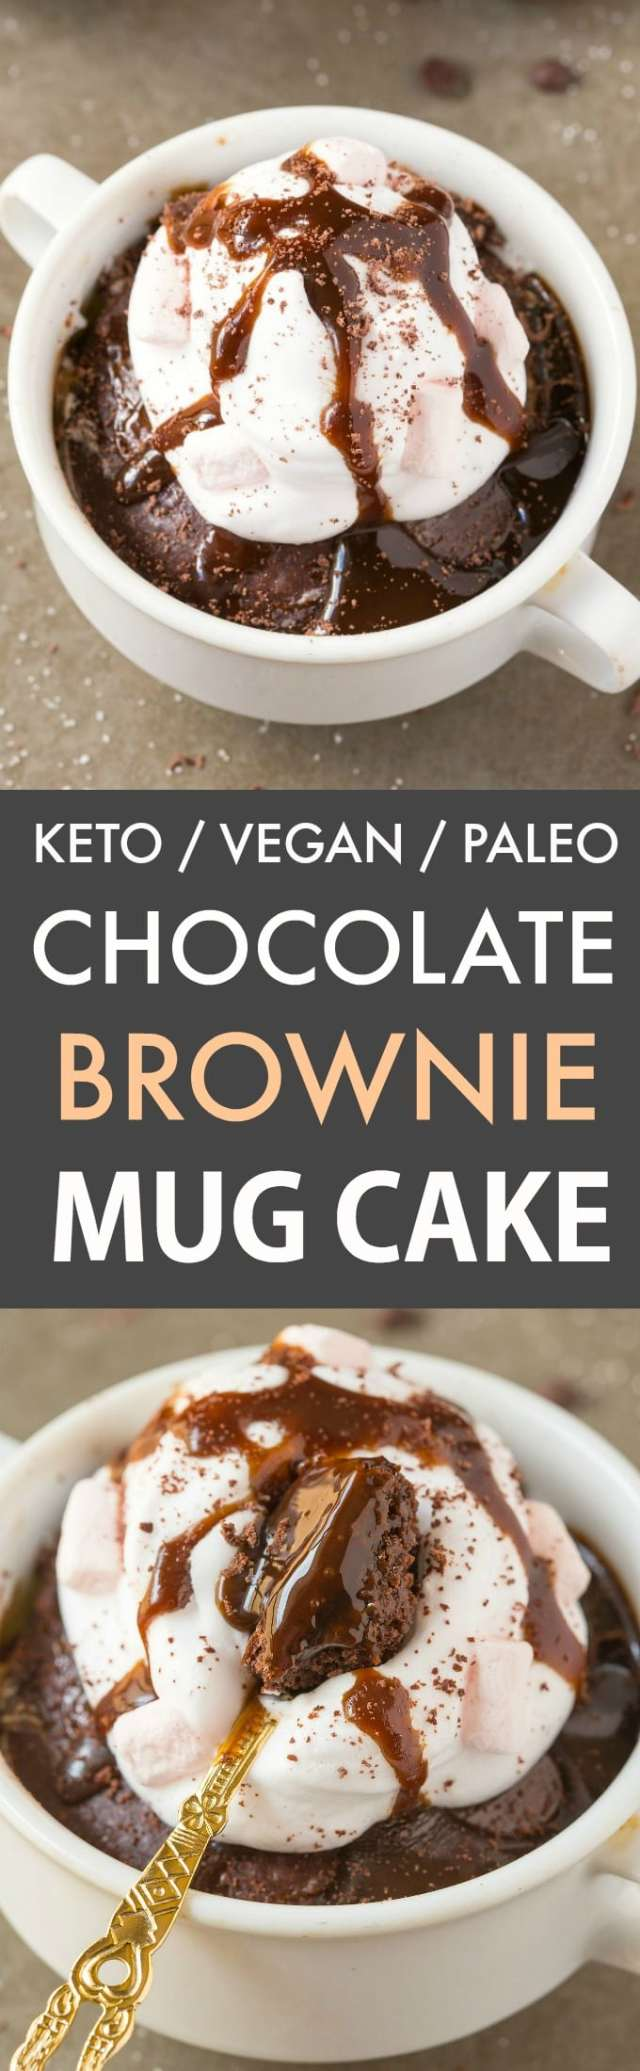 Keto Hot Chocolate Brownie Mug Cake (Paleo, Vegan)